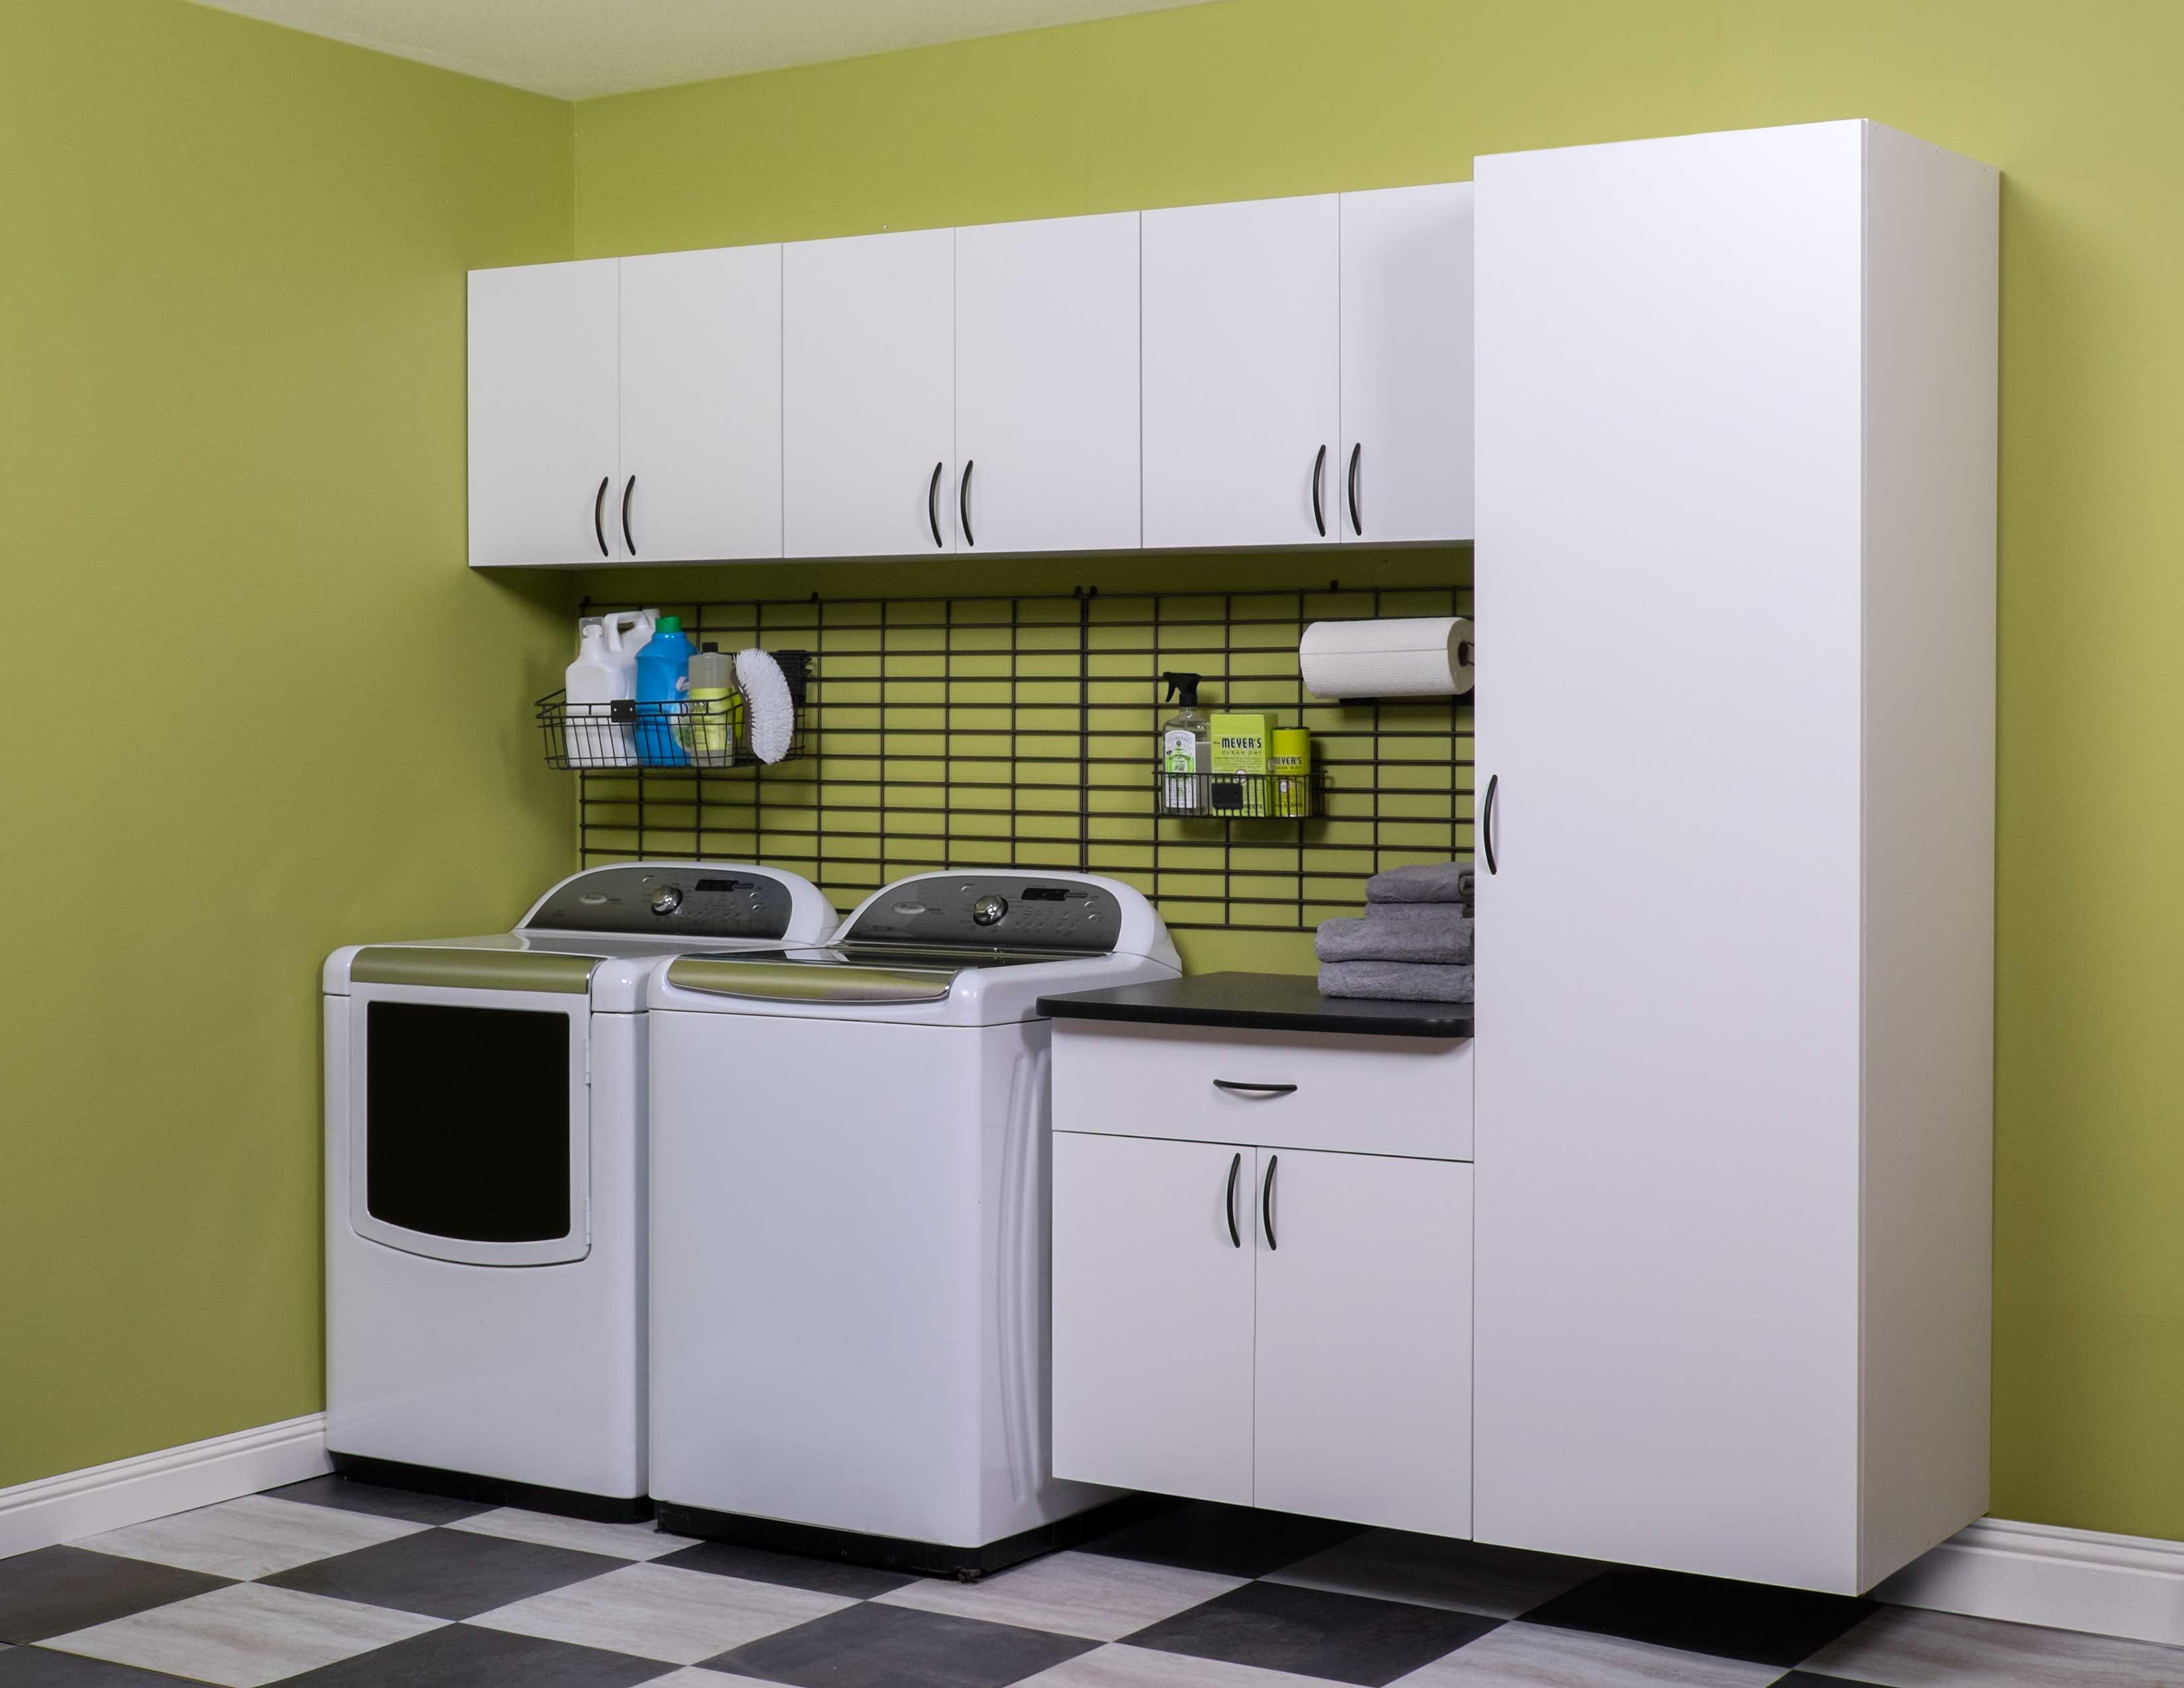 4 Ways To Organize The Laundry Room Arizona Garage Design